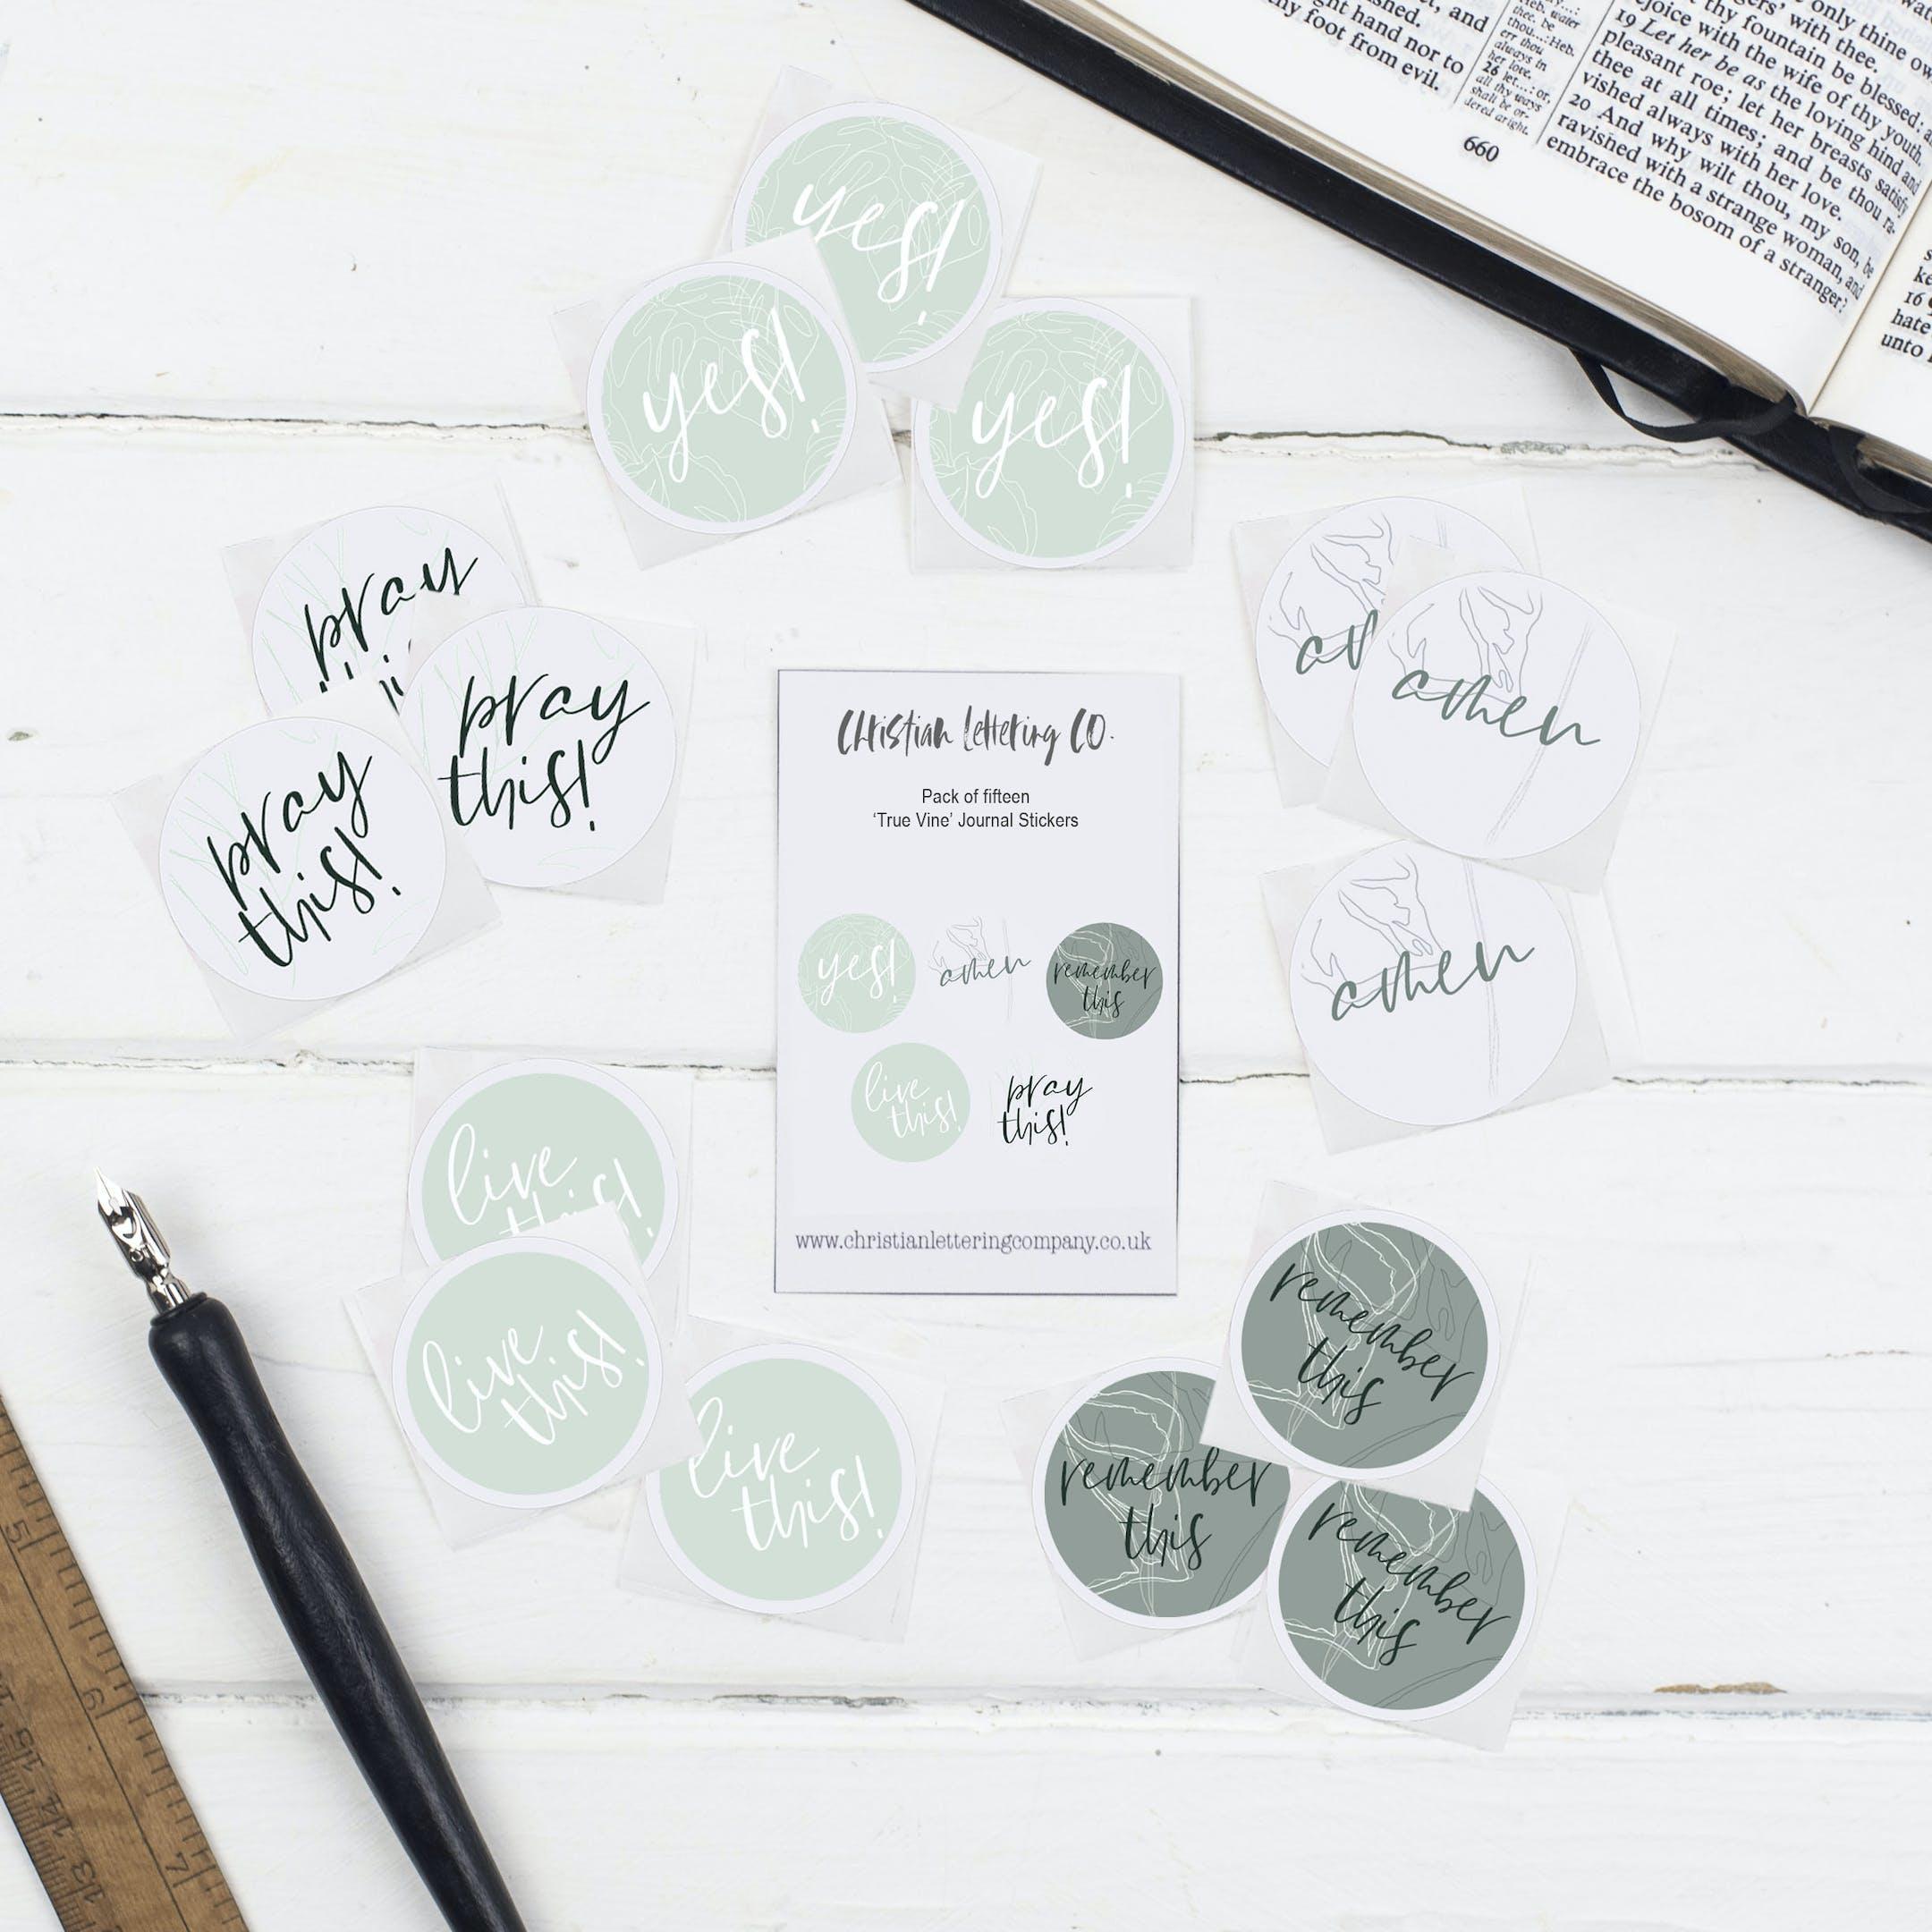 Bible Journal Stickers - True Vine - Christian Lettering Company